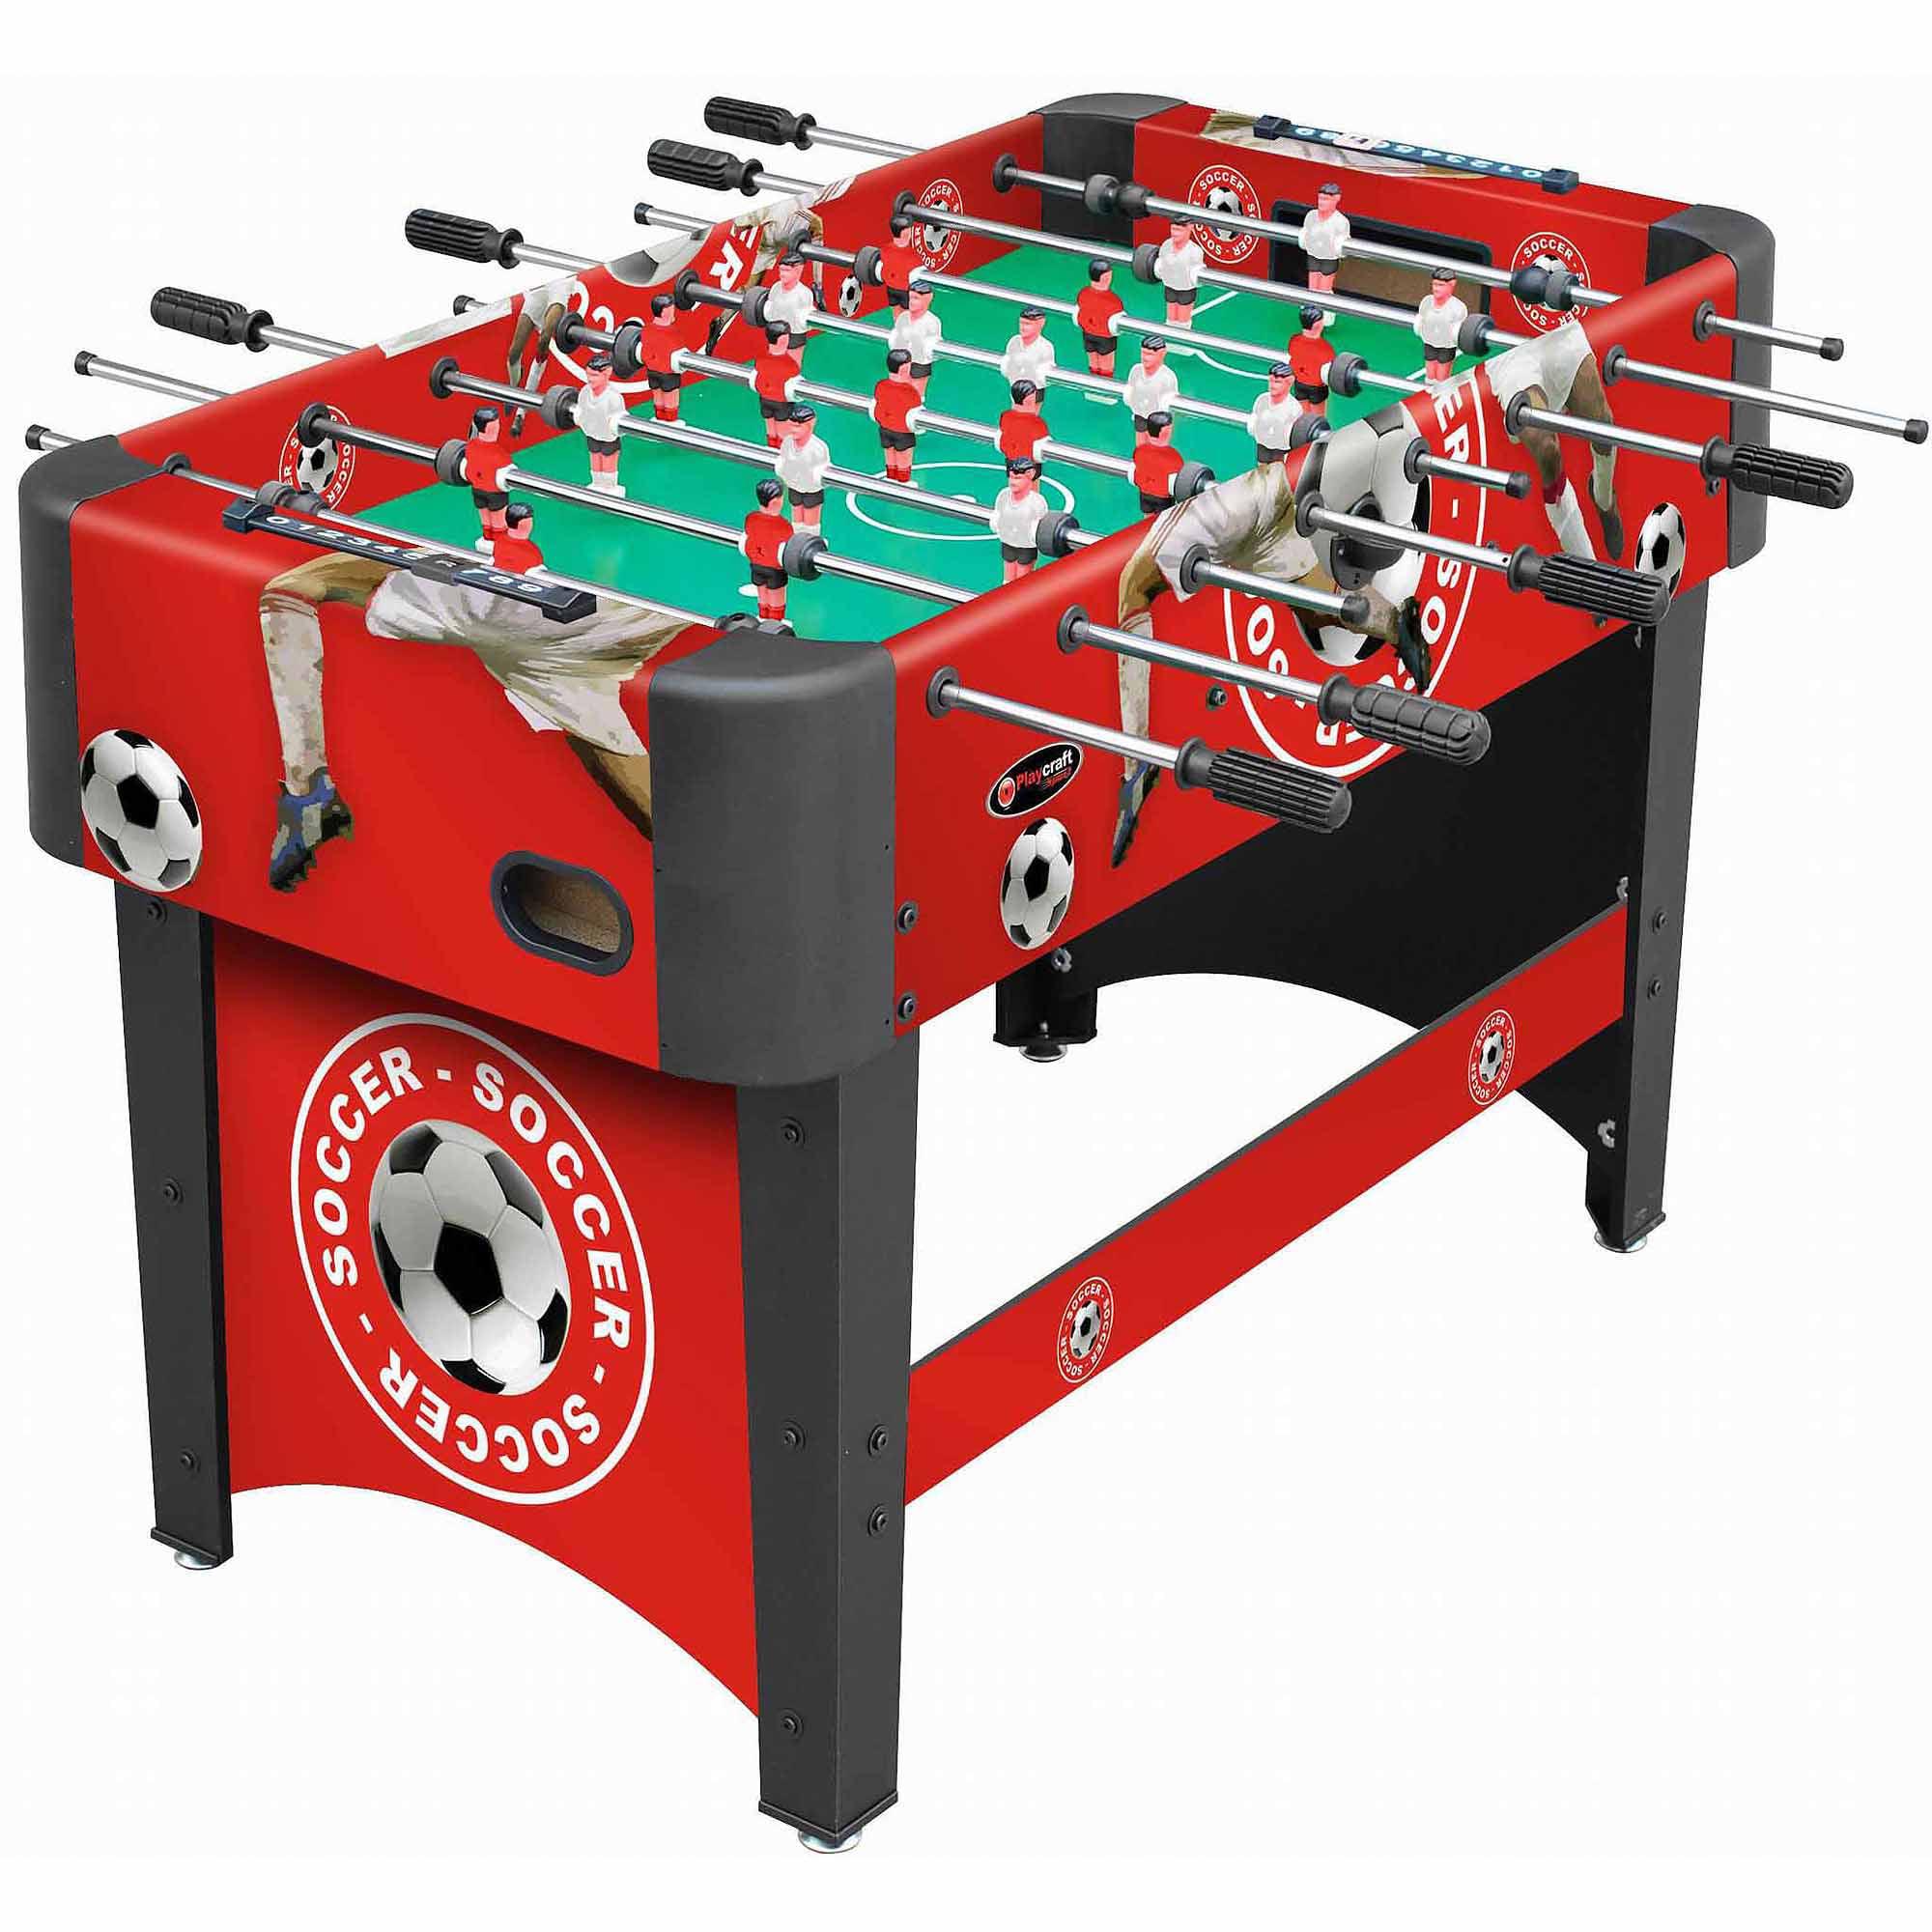 "Playcraft Sport 48"" Foosball Table, Red"